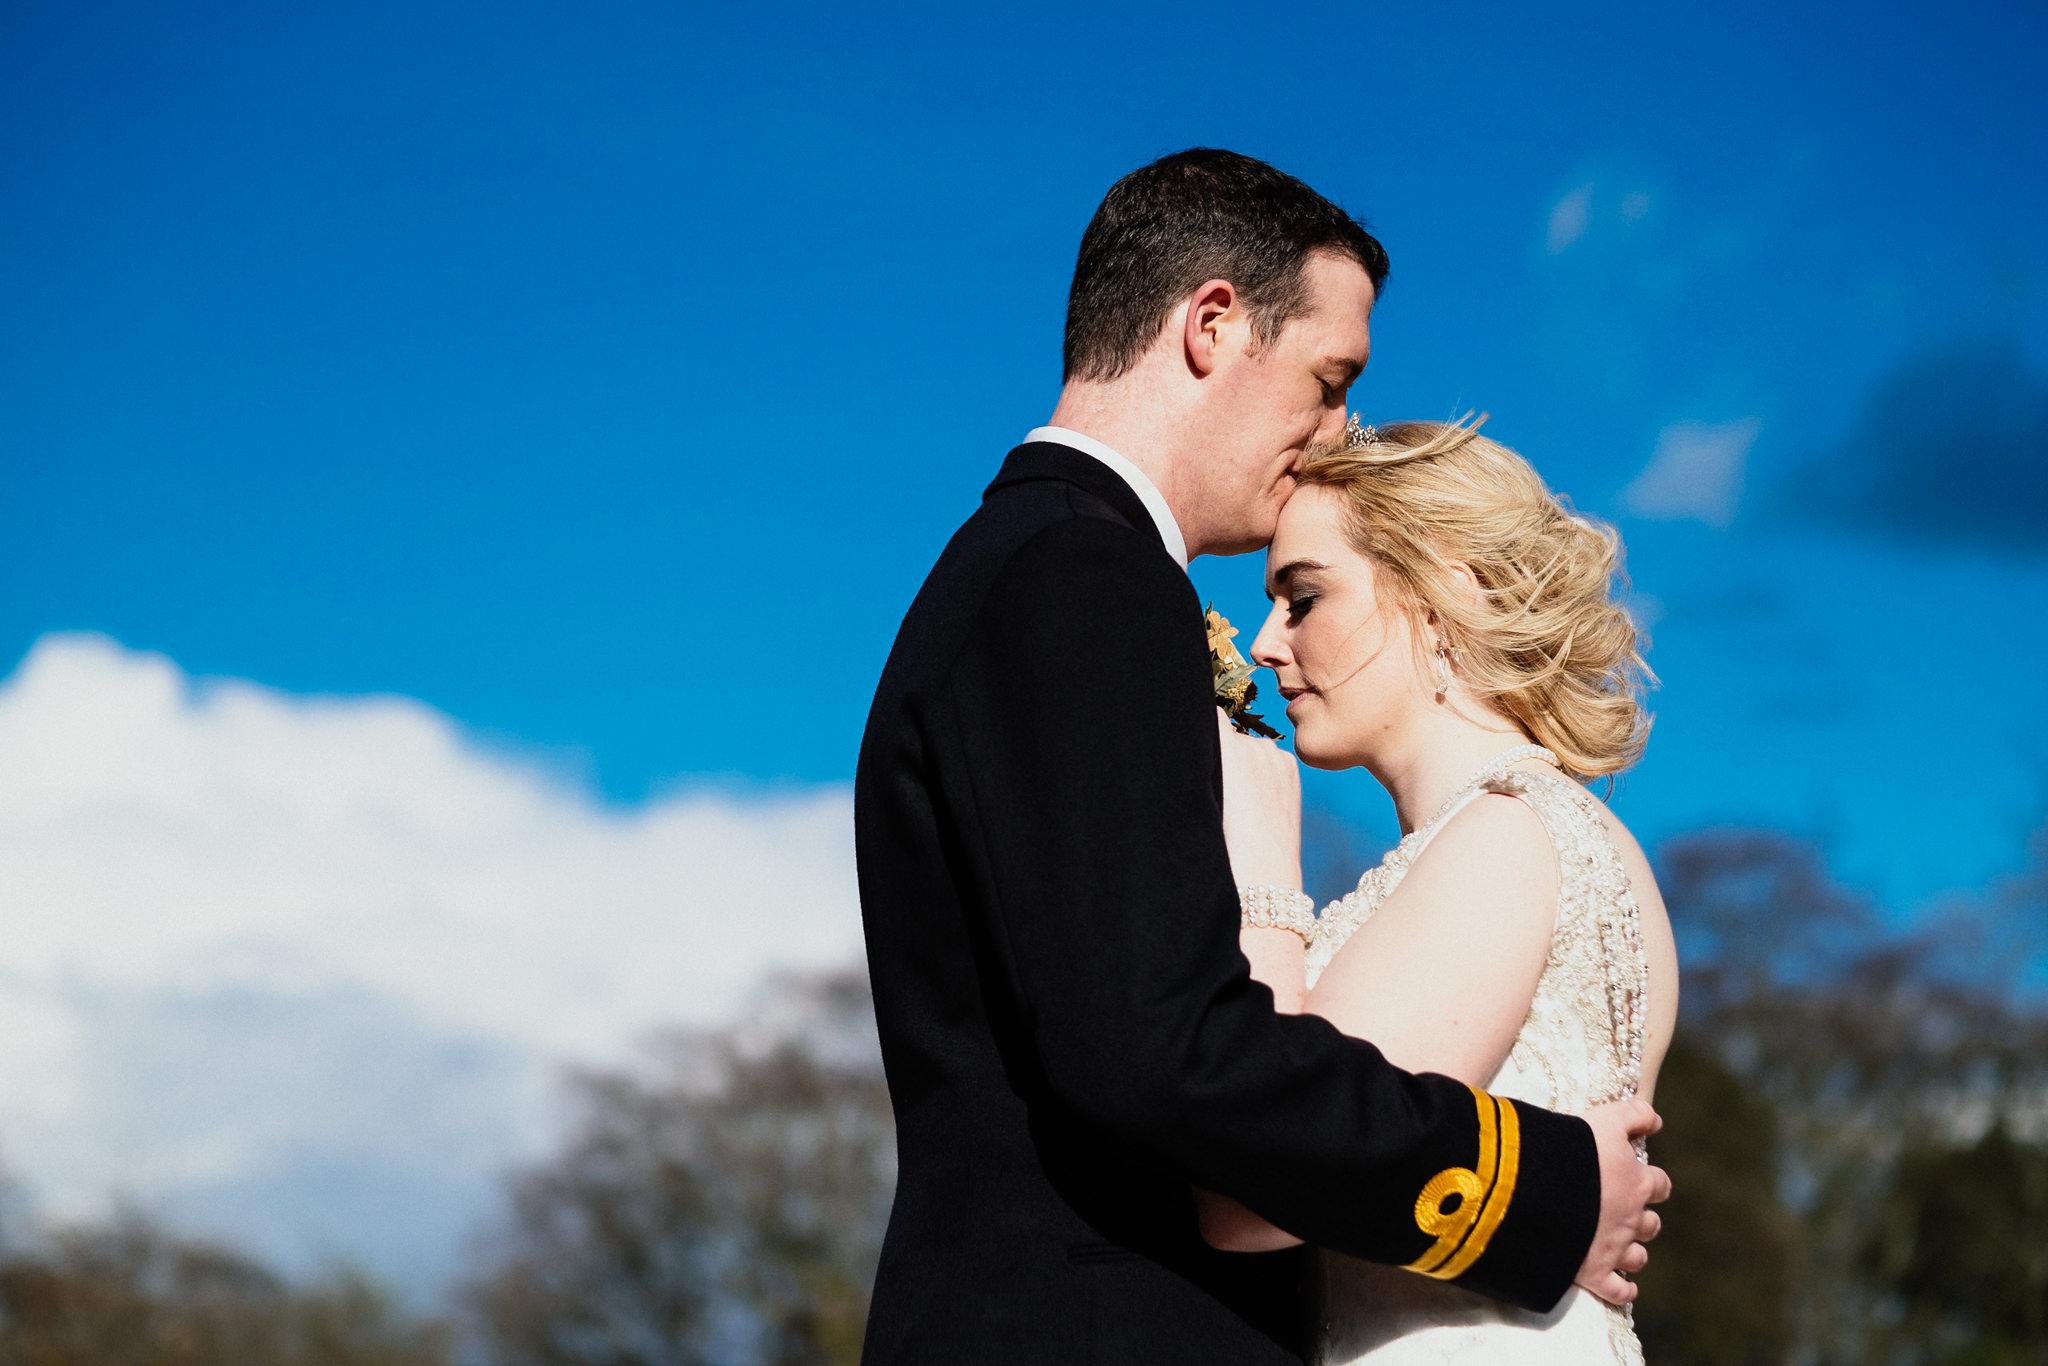 Edinburgh Wedding Photographer_Euan Robertson Photography_011.jpg